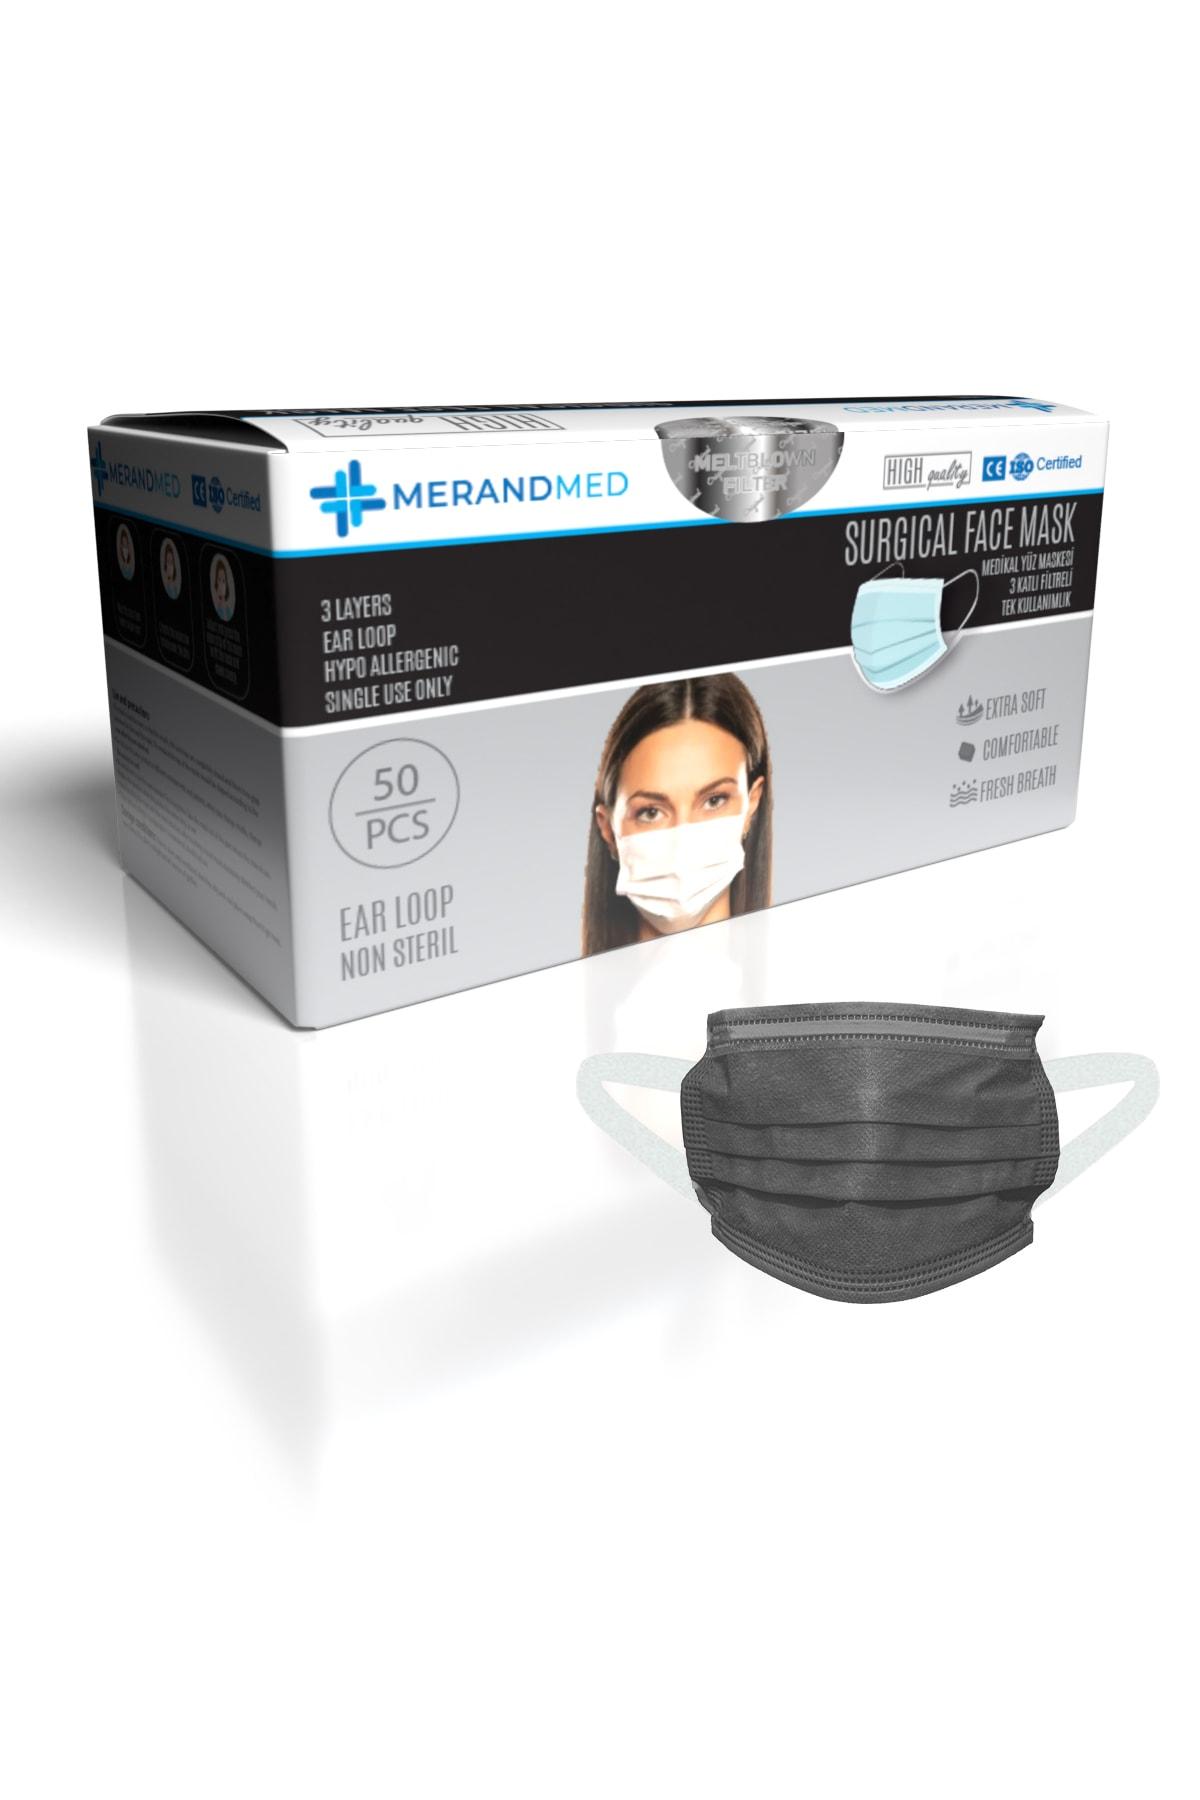 3 Katlı Meltblown-spoundbond Yeni Nesil Cerrahi Maske - 1 Kutu ( Kutu Içi 50 Adet ) - Siyah Renk